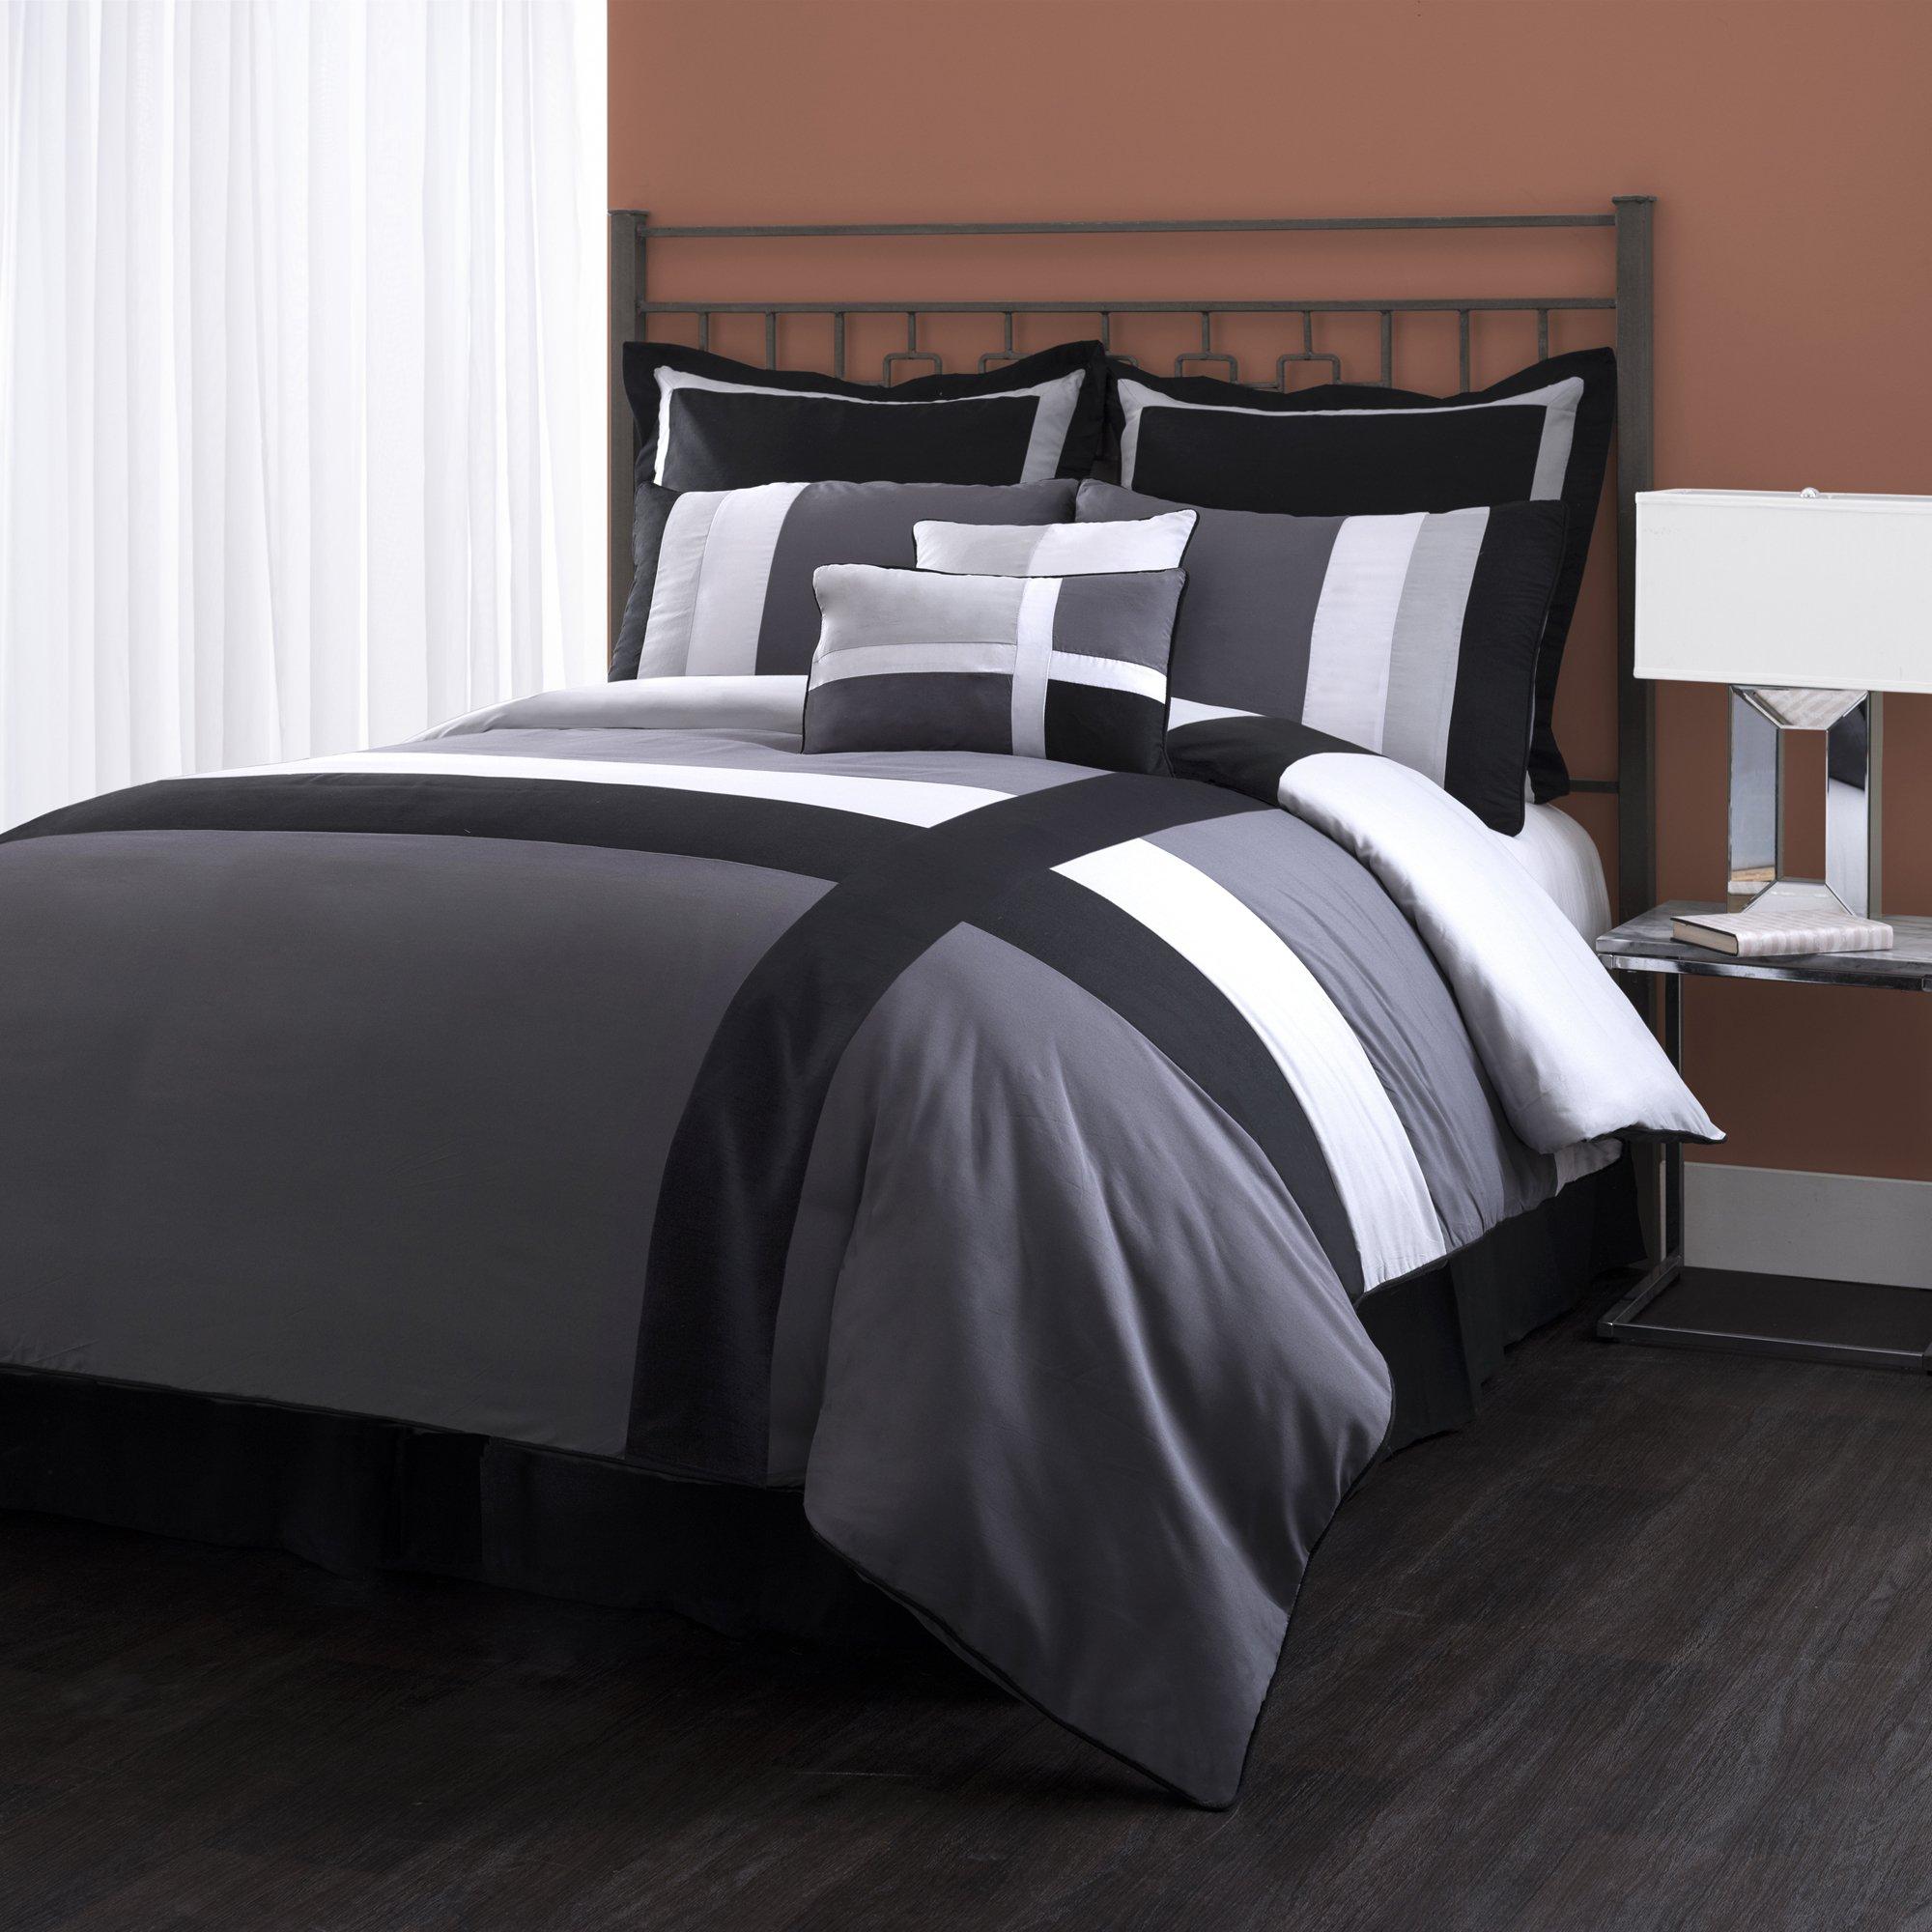 lush decor isa 8 piece comforter set queen gray black ebay. Black Bedroom Furniture Sets. Home Design Ideas